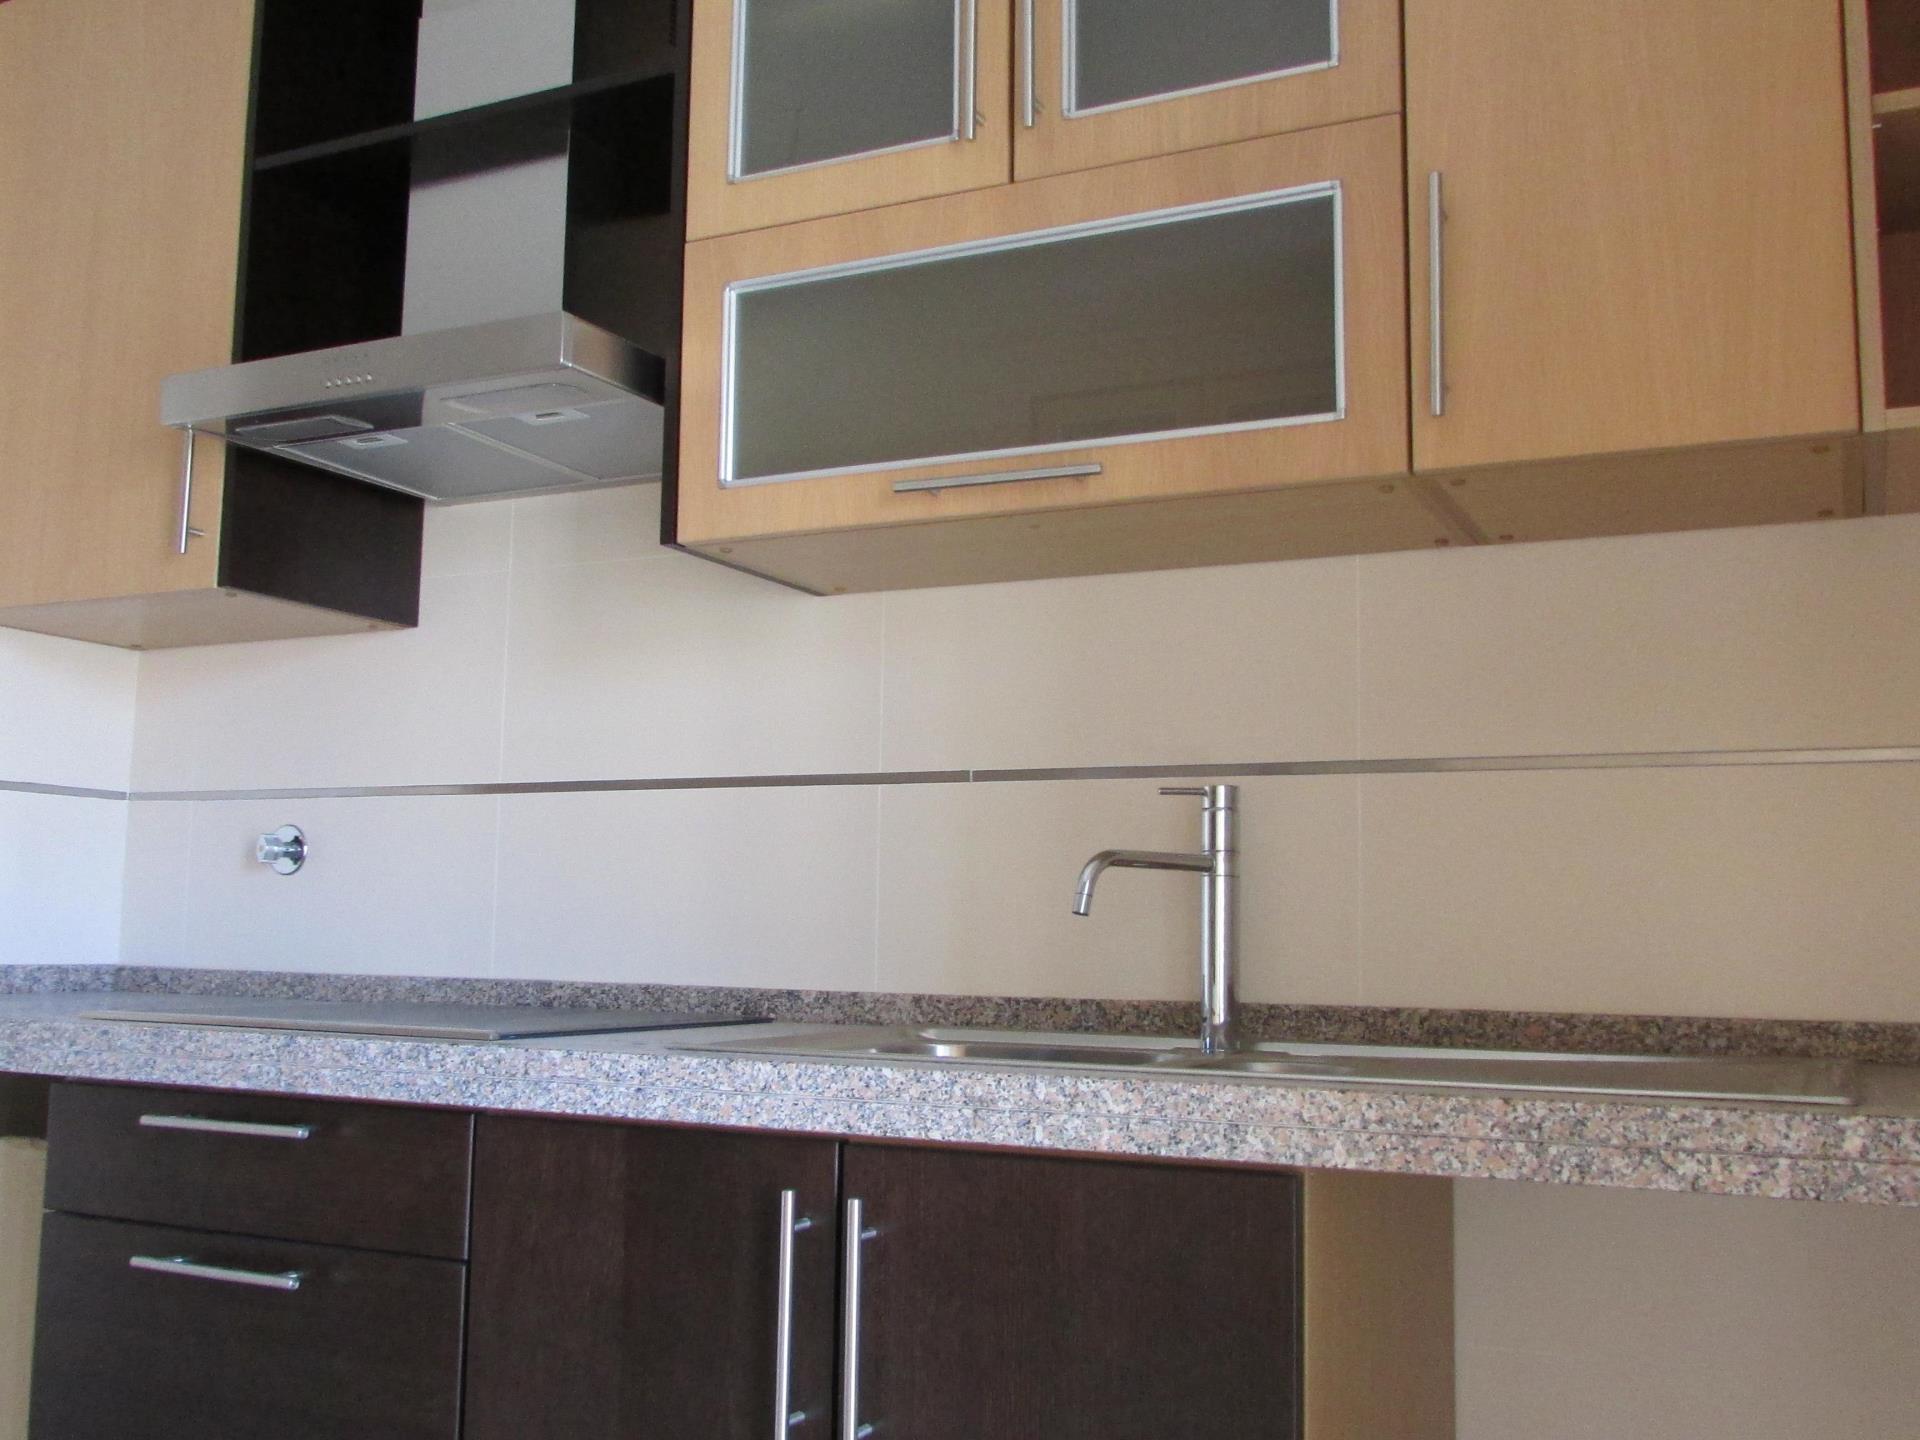 Duplex per Vendita alle ore Duplex, 3 bedrooms, for Sale Carcavelos, Cascais, Lisbona Portogallo